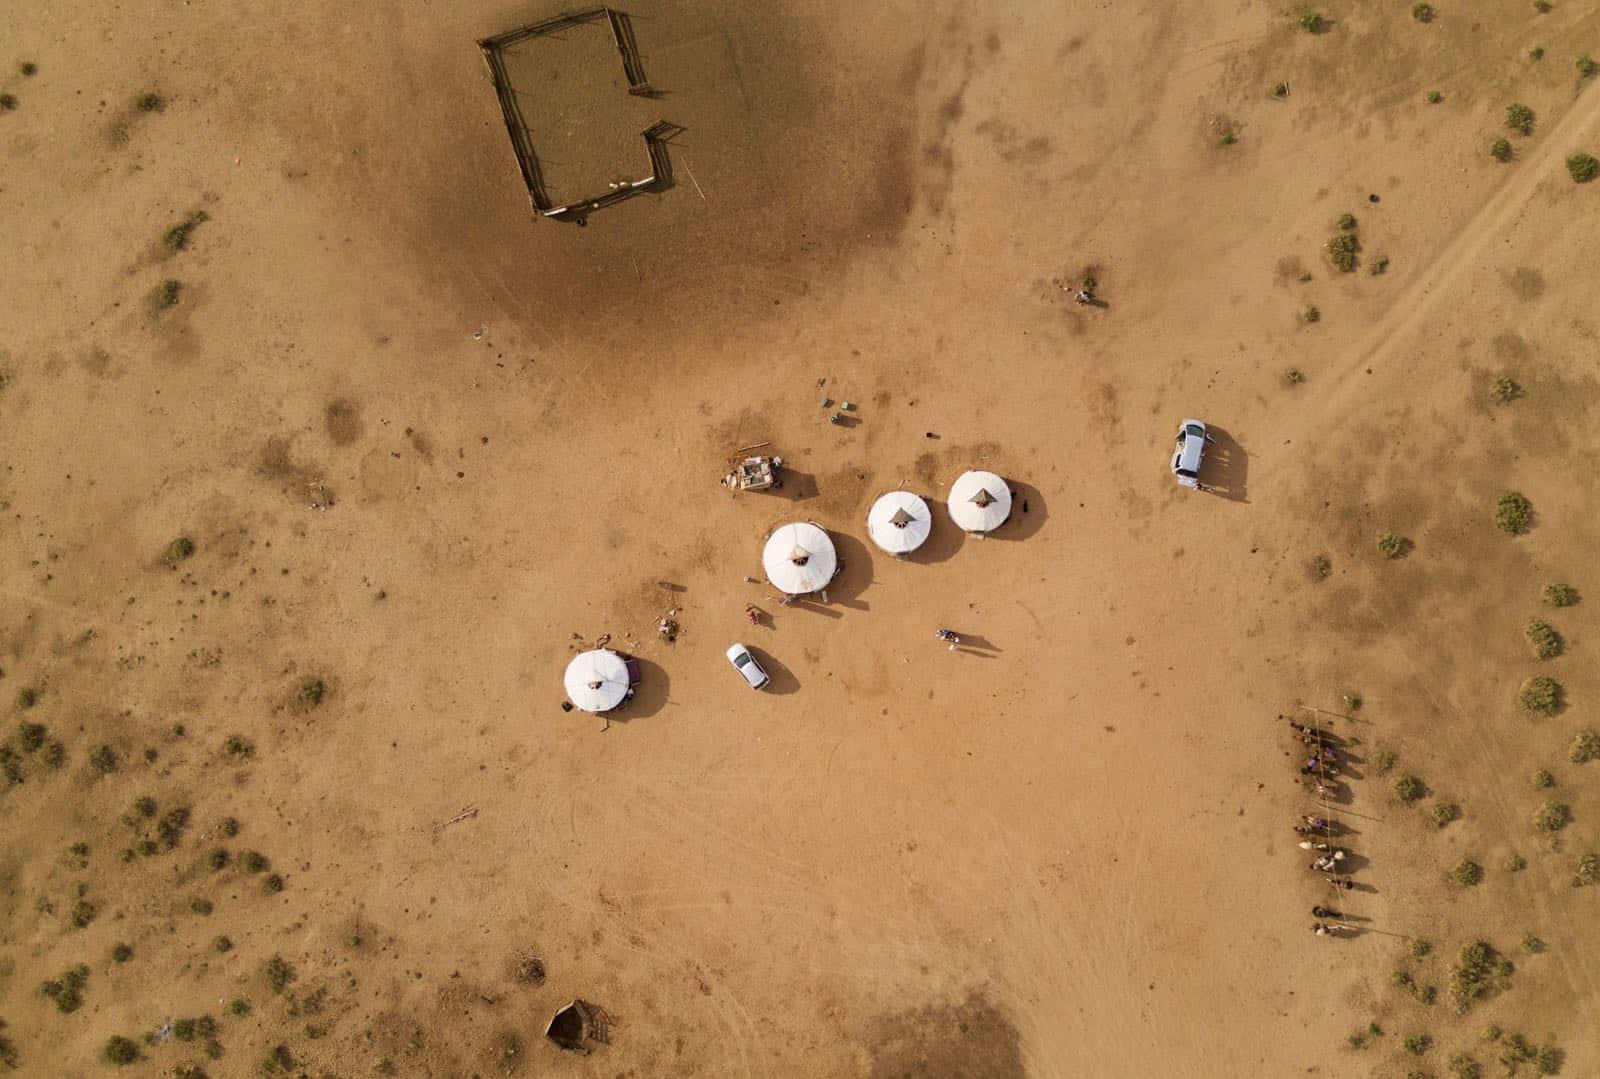 Drone Mavic Pro Mongolian Ger Camp Nomads betternotstop